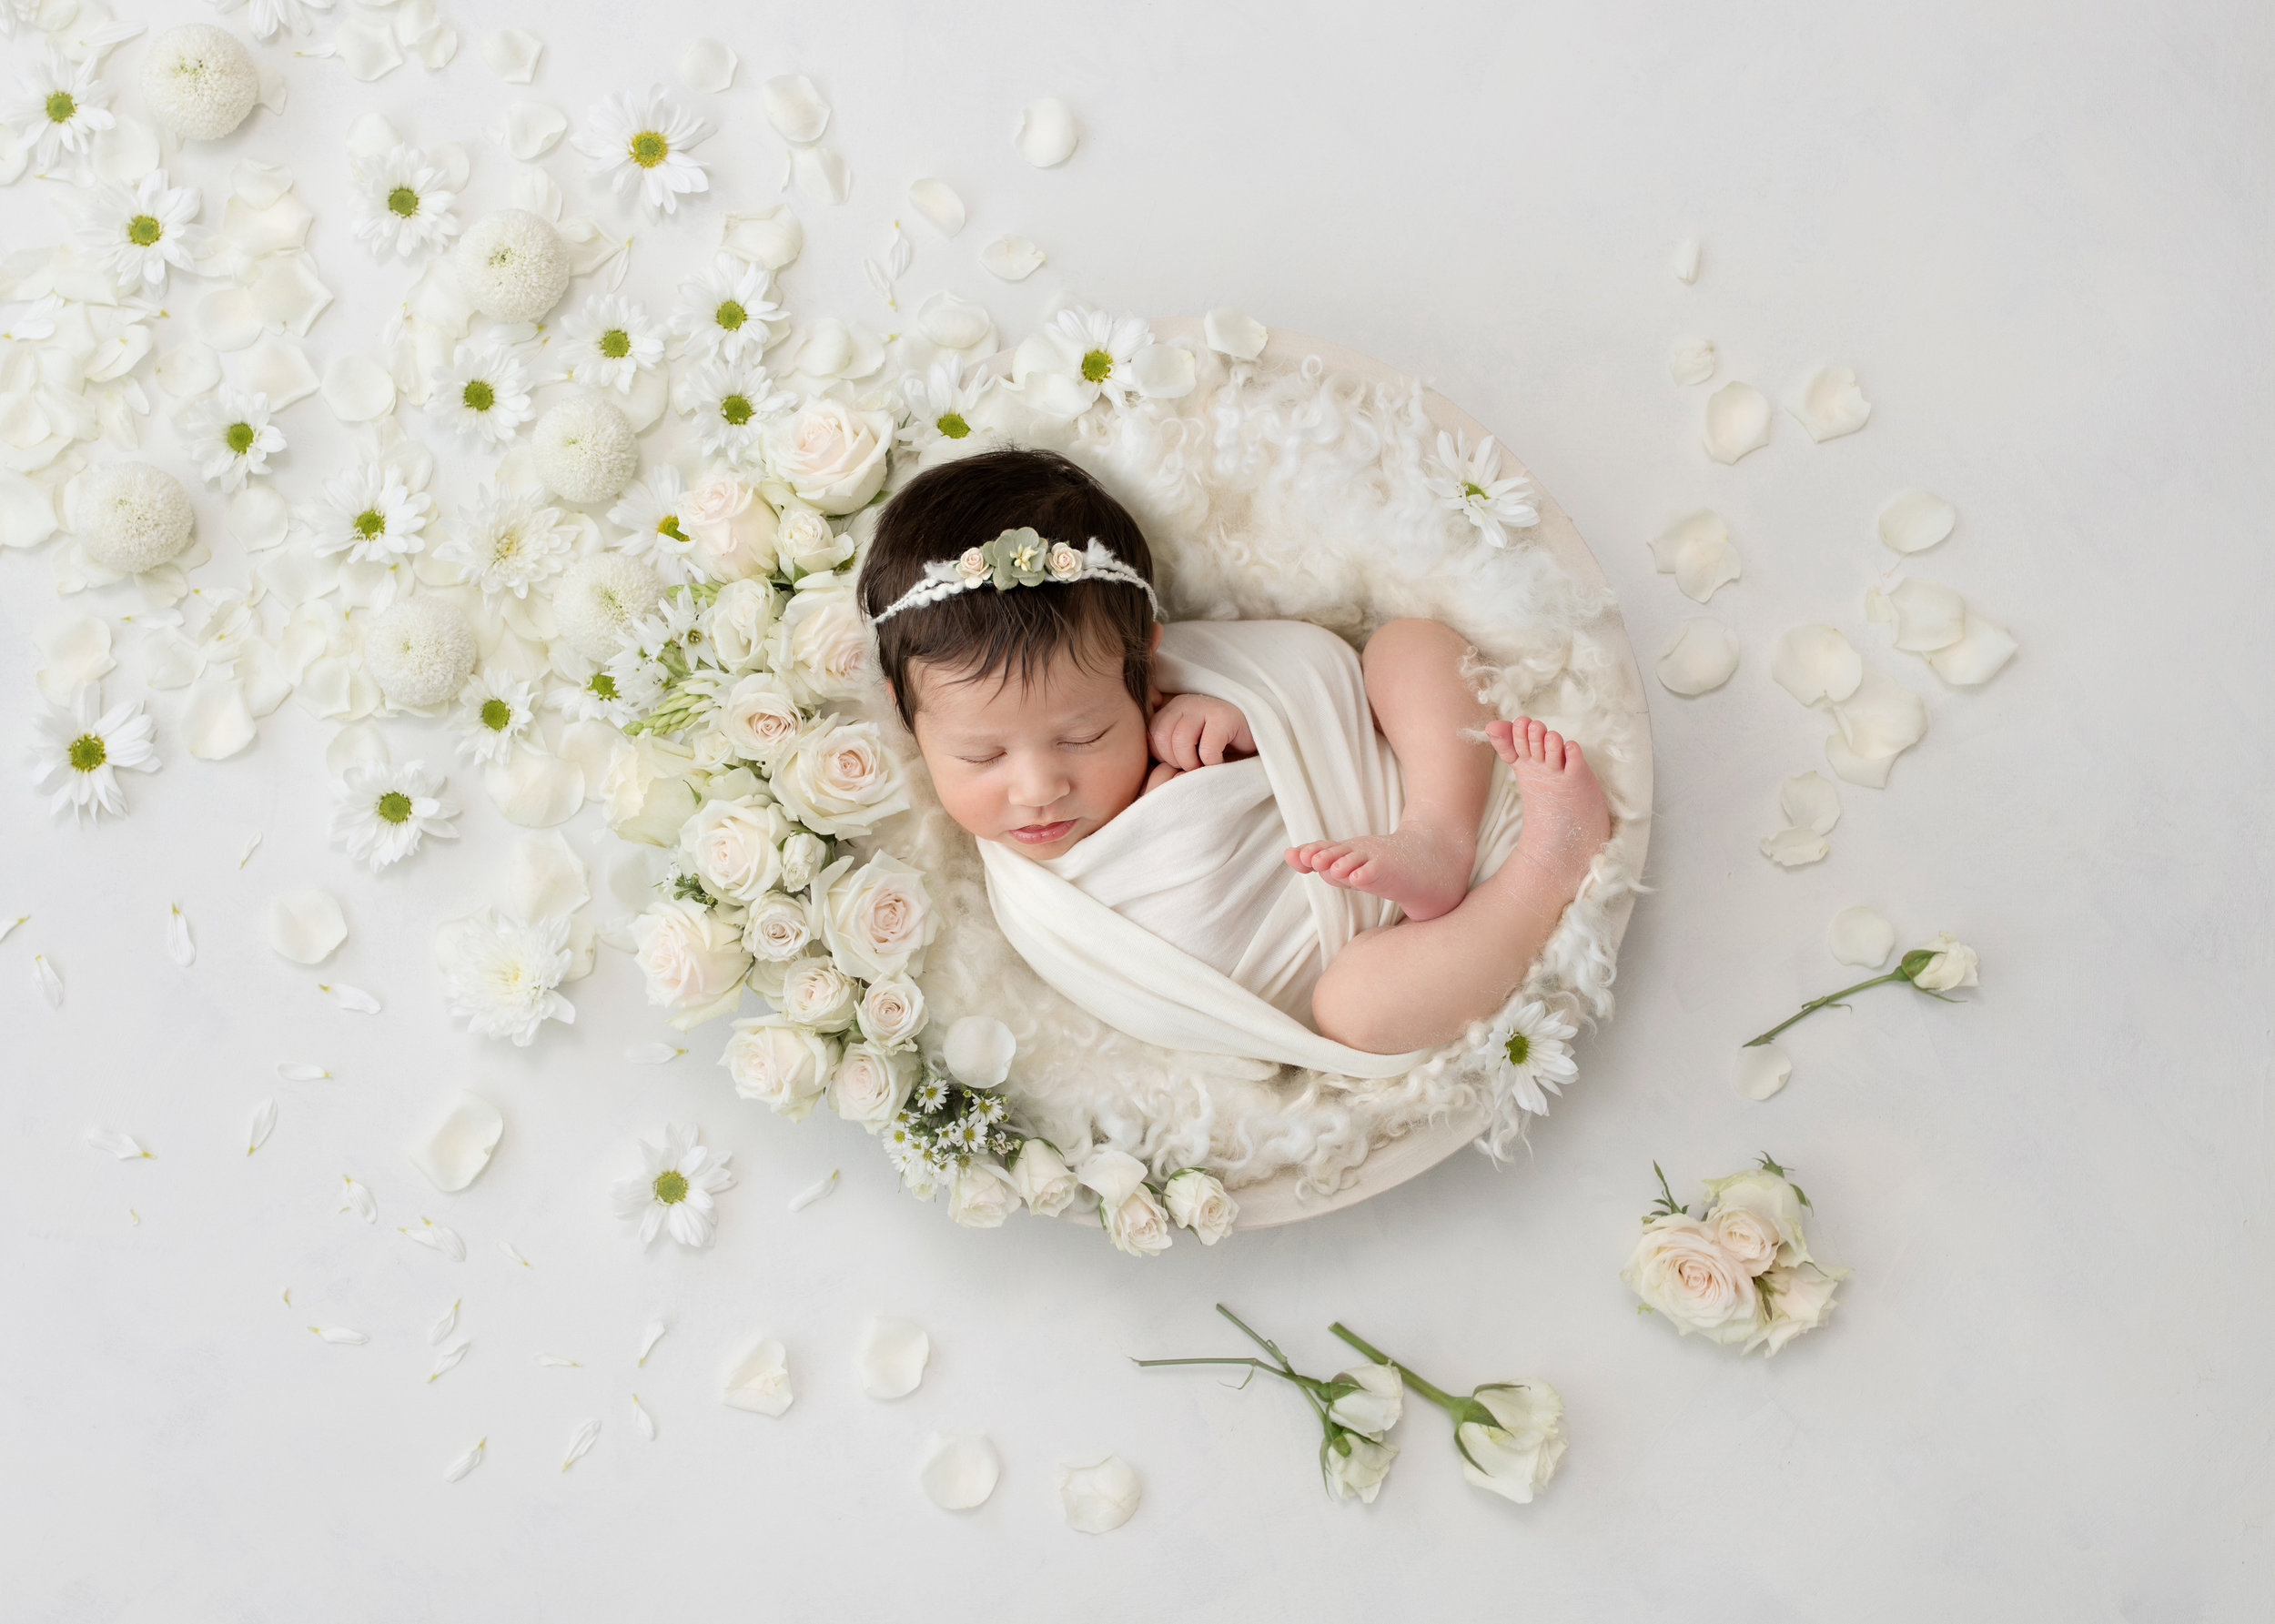 Karen Kimmins newborn photography specialist..jpg